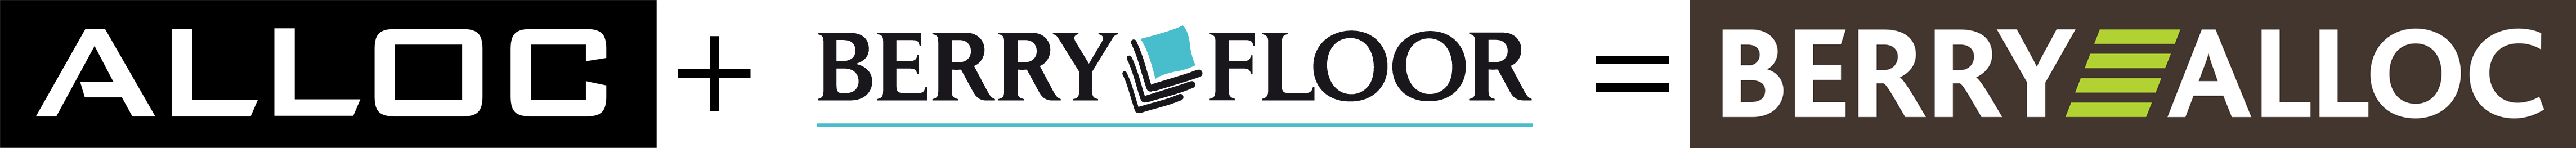 logo_BerryAllocFloor